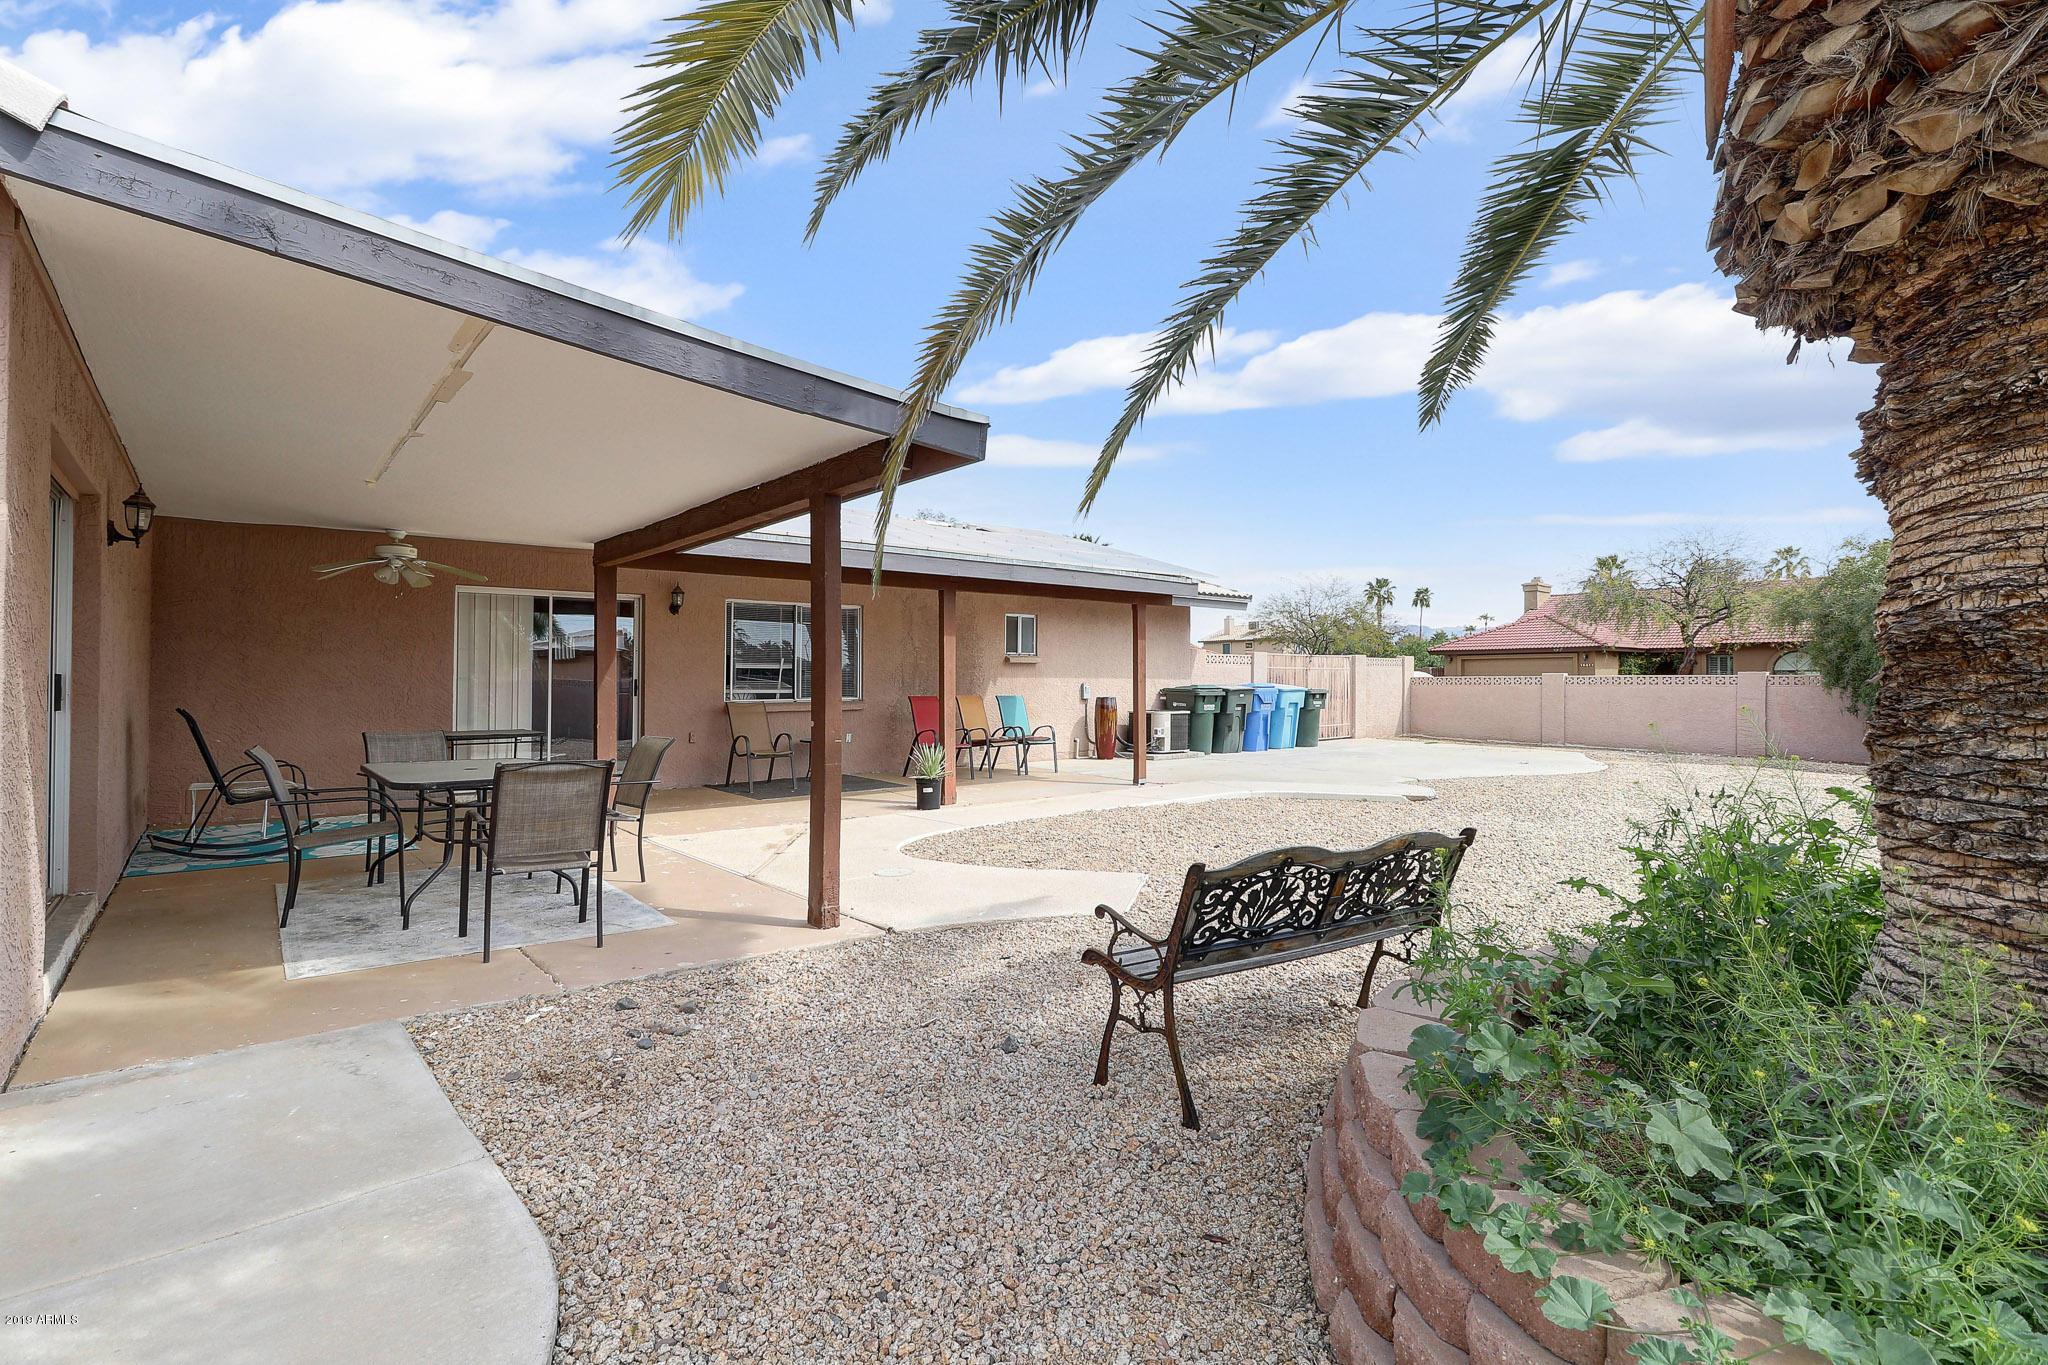 MLS 5896695 5857 E BETTY ELYSE Lane, Scottsdale, AZ 85254 Scottsdale AZ Cactus Glen